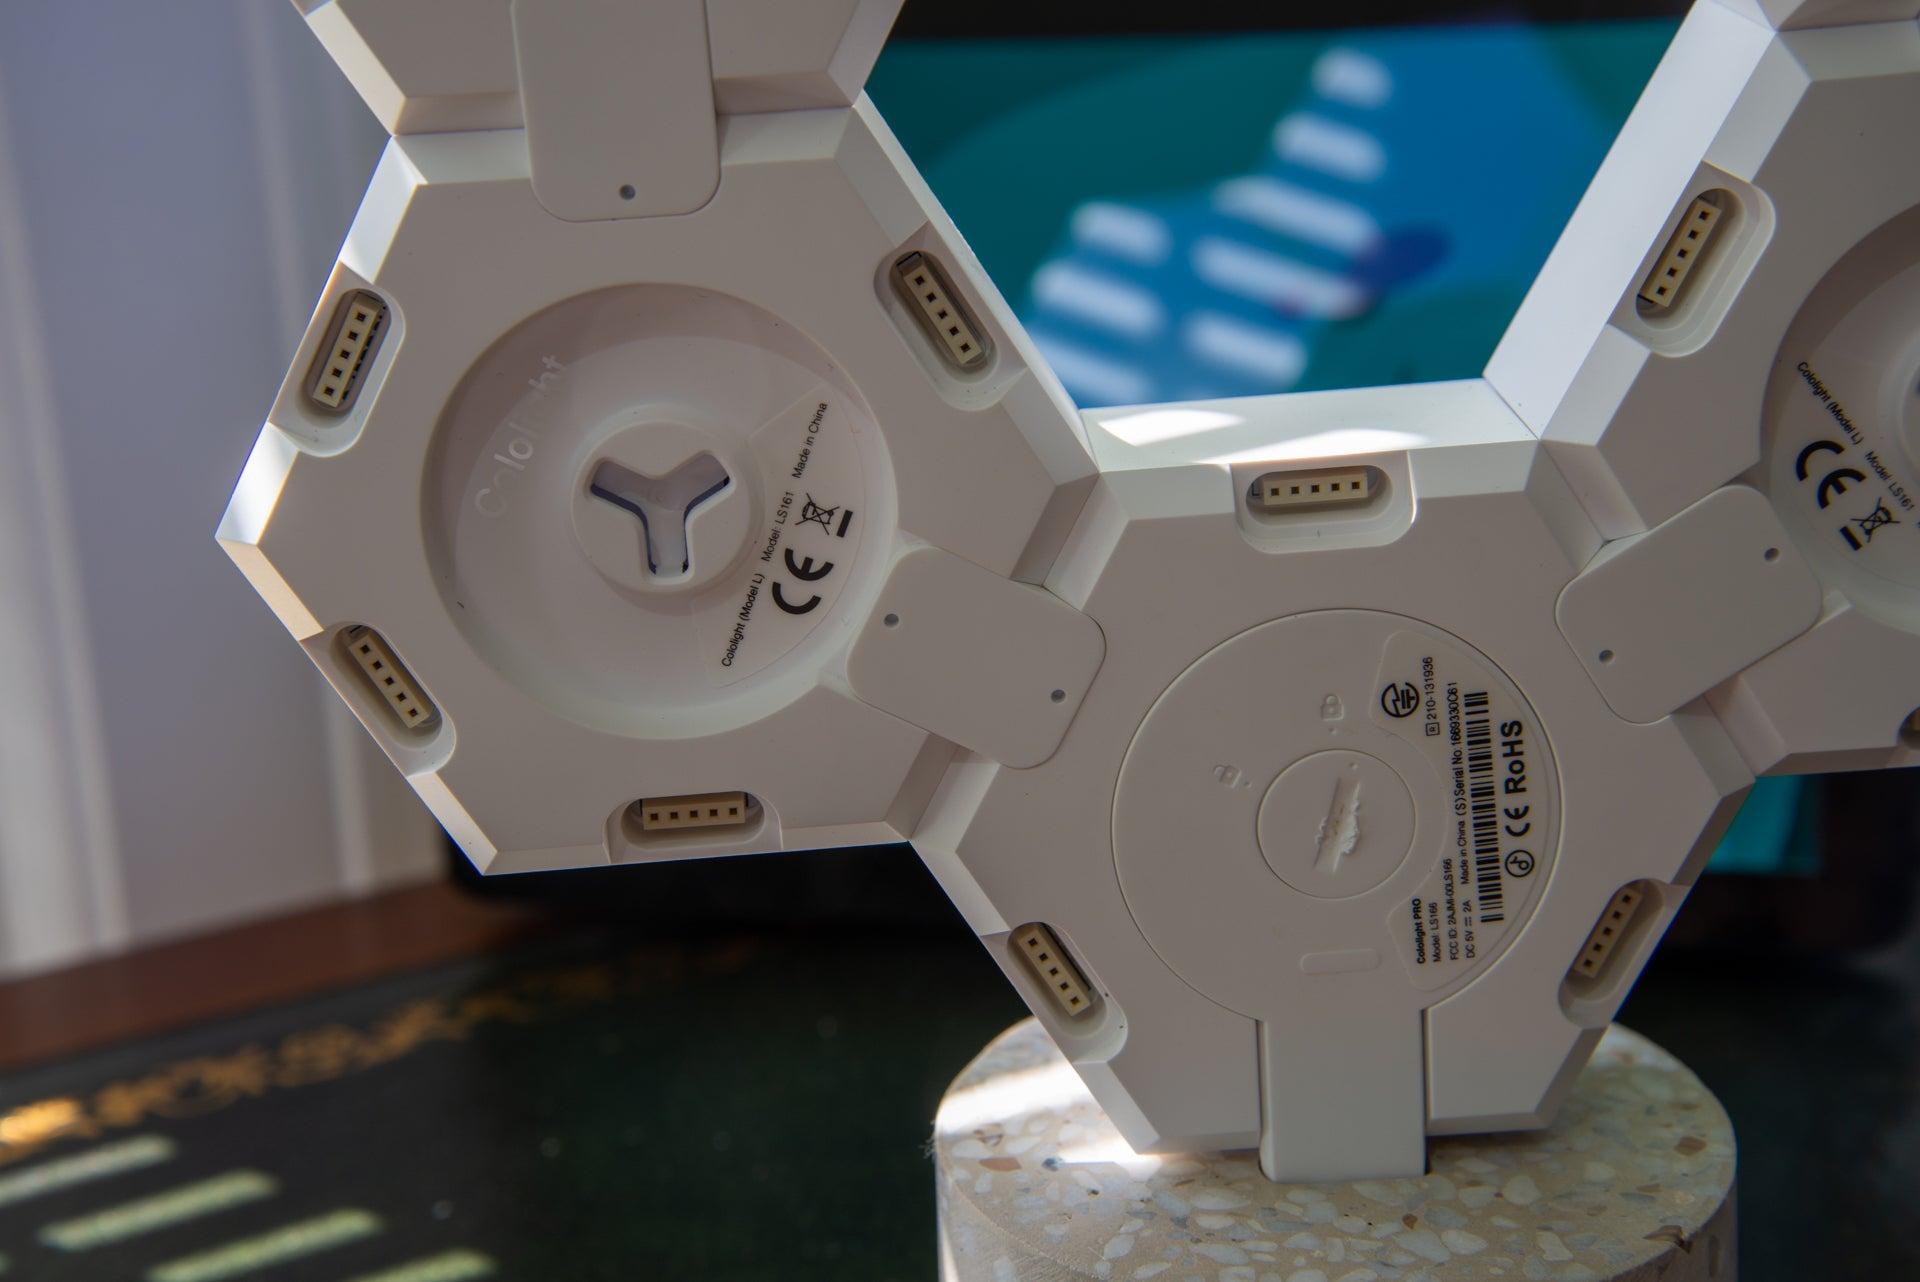 LifeSmart Cololight Pro rear connectors